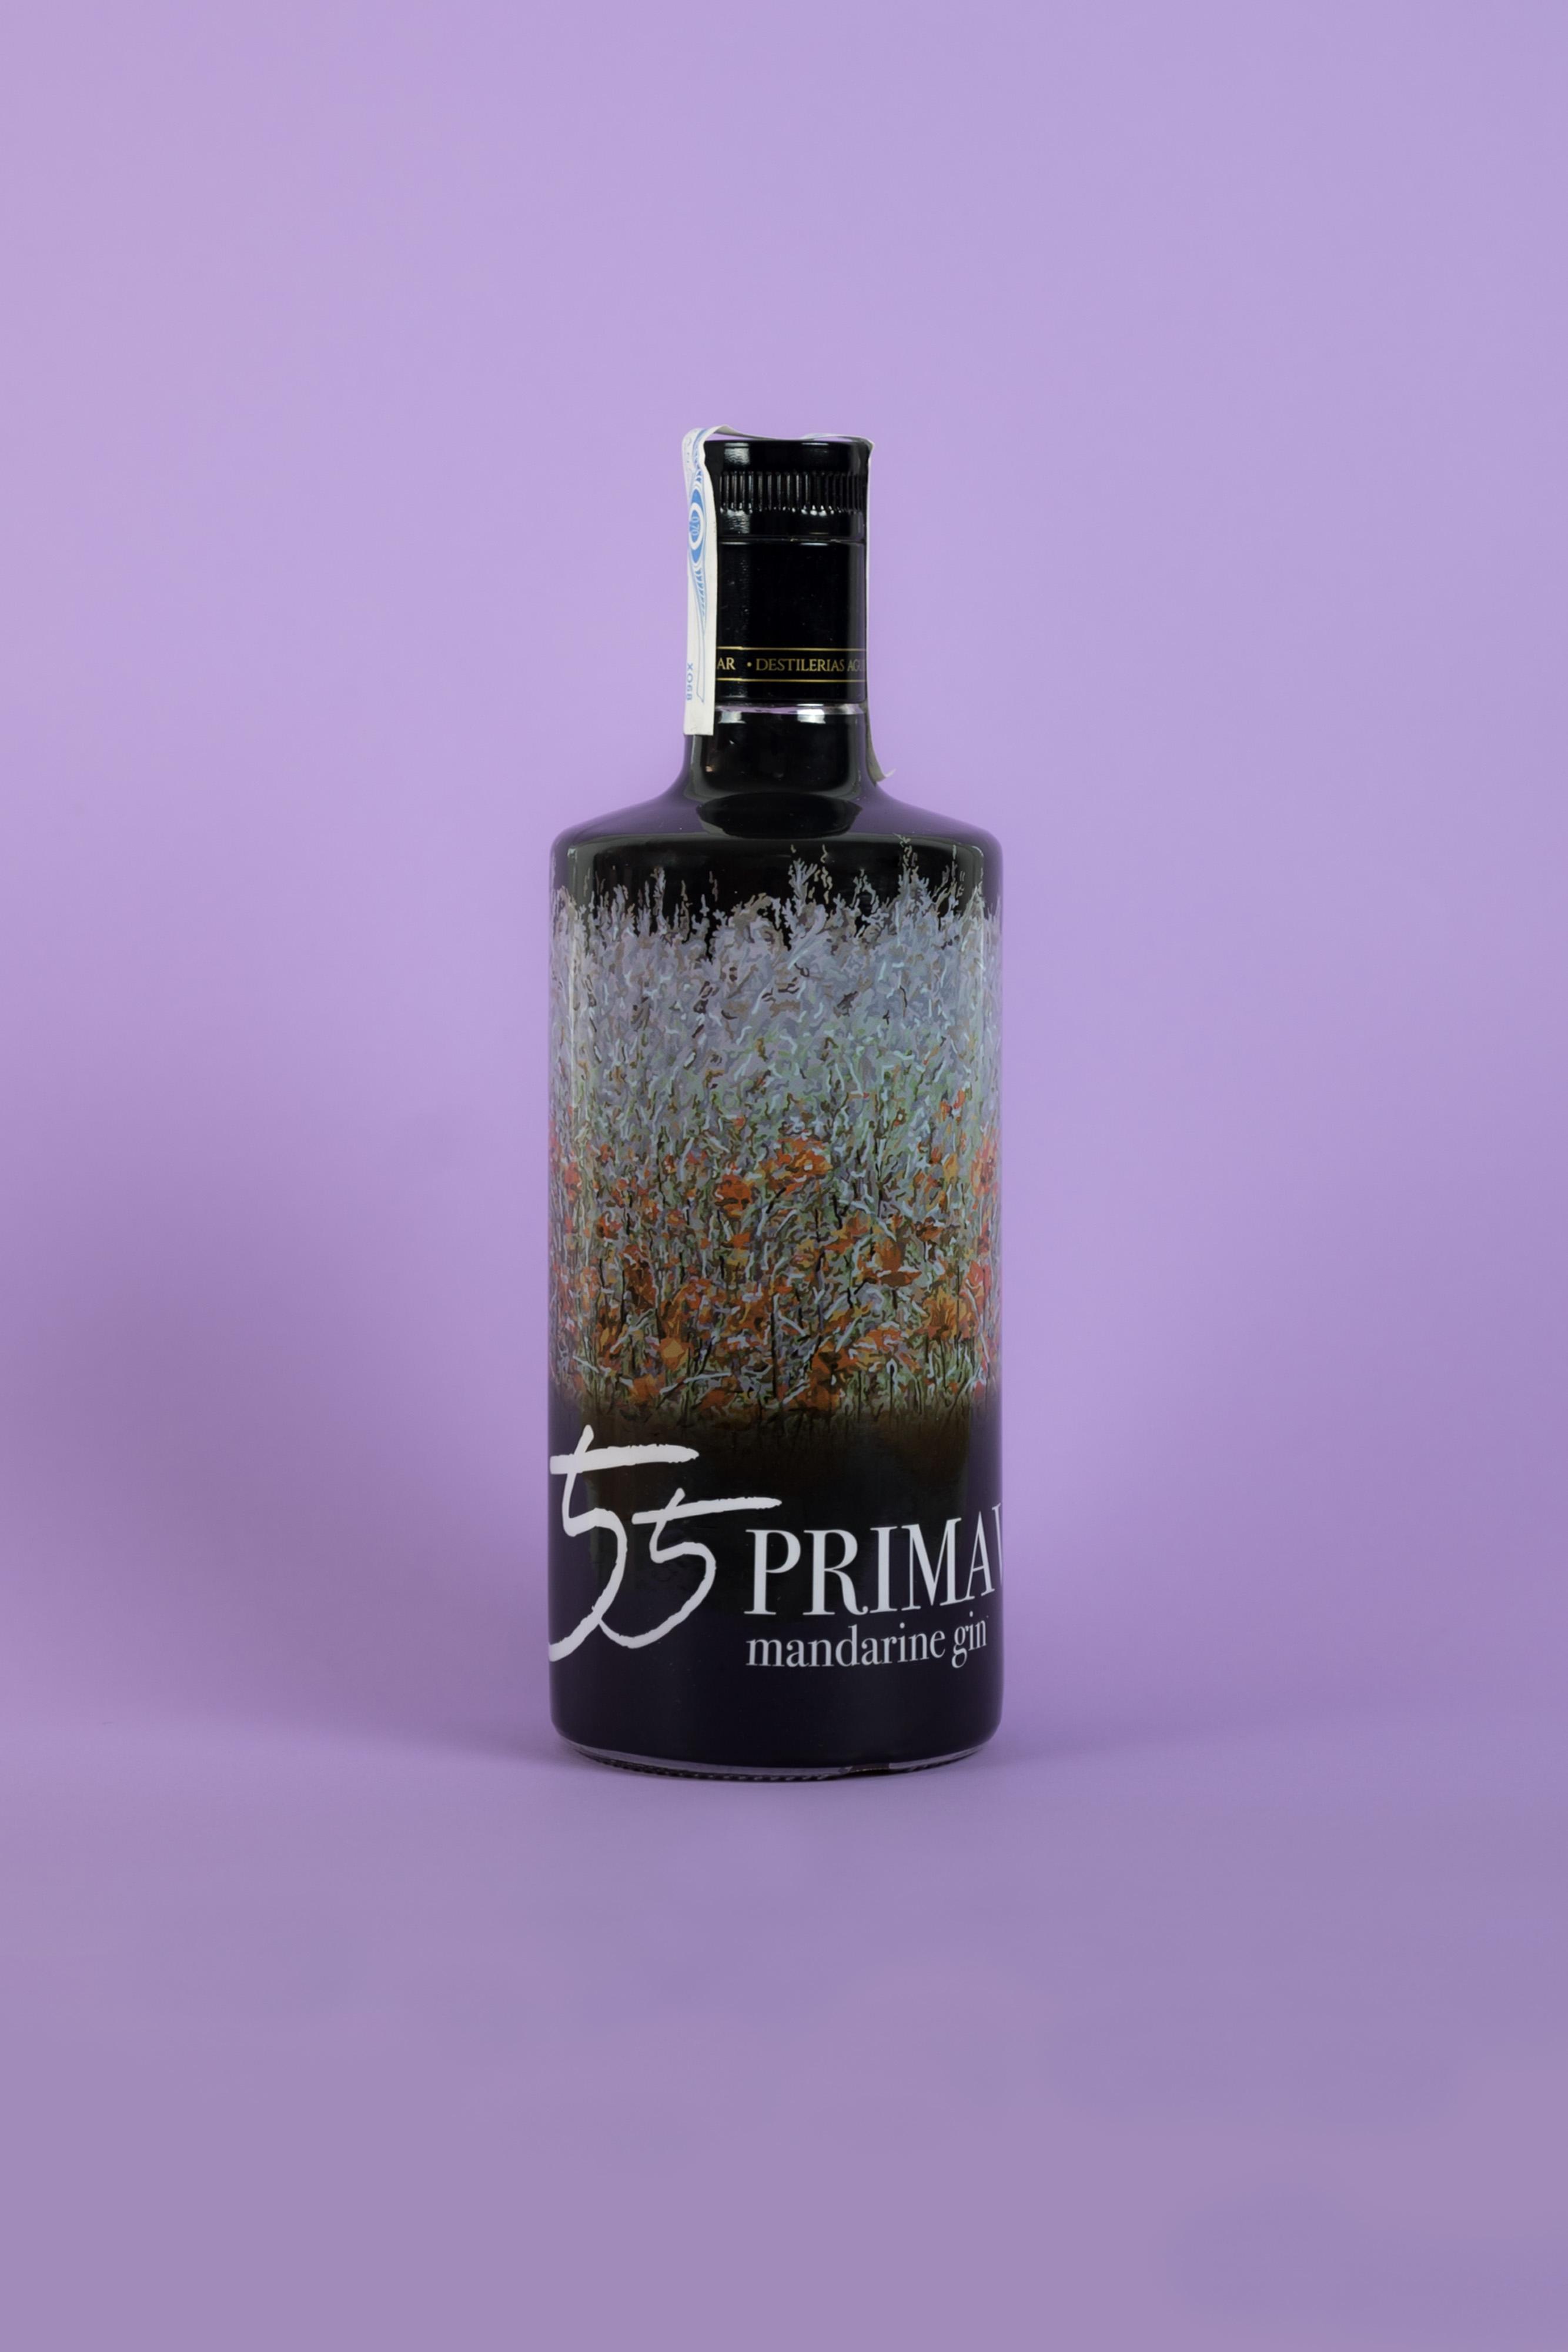 Botella Ginebra 55 Primaveras de Mandarina